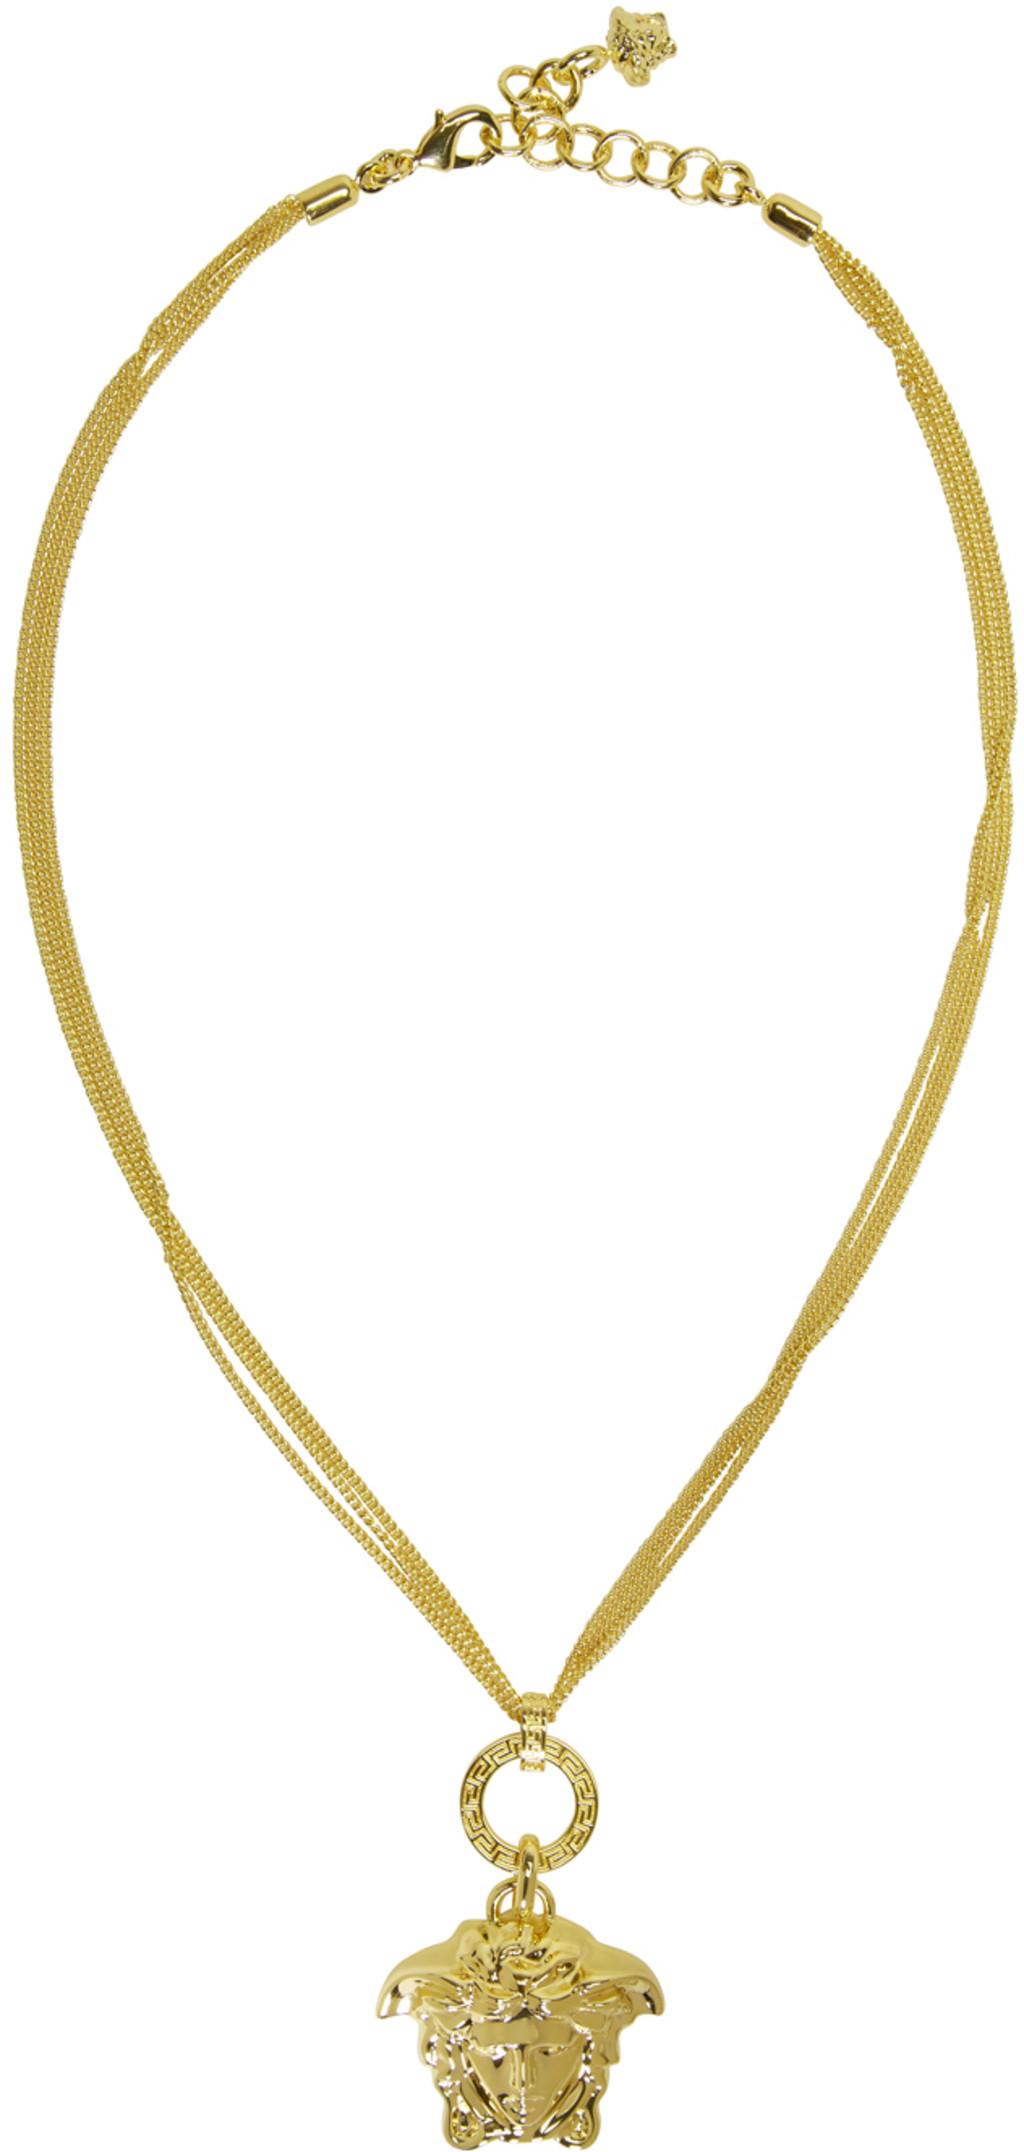 Designer necklaces for Women | SSENSE